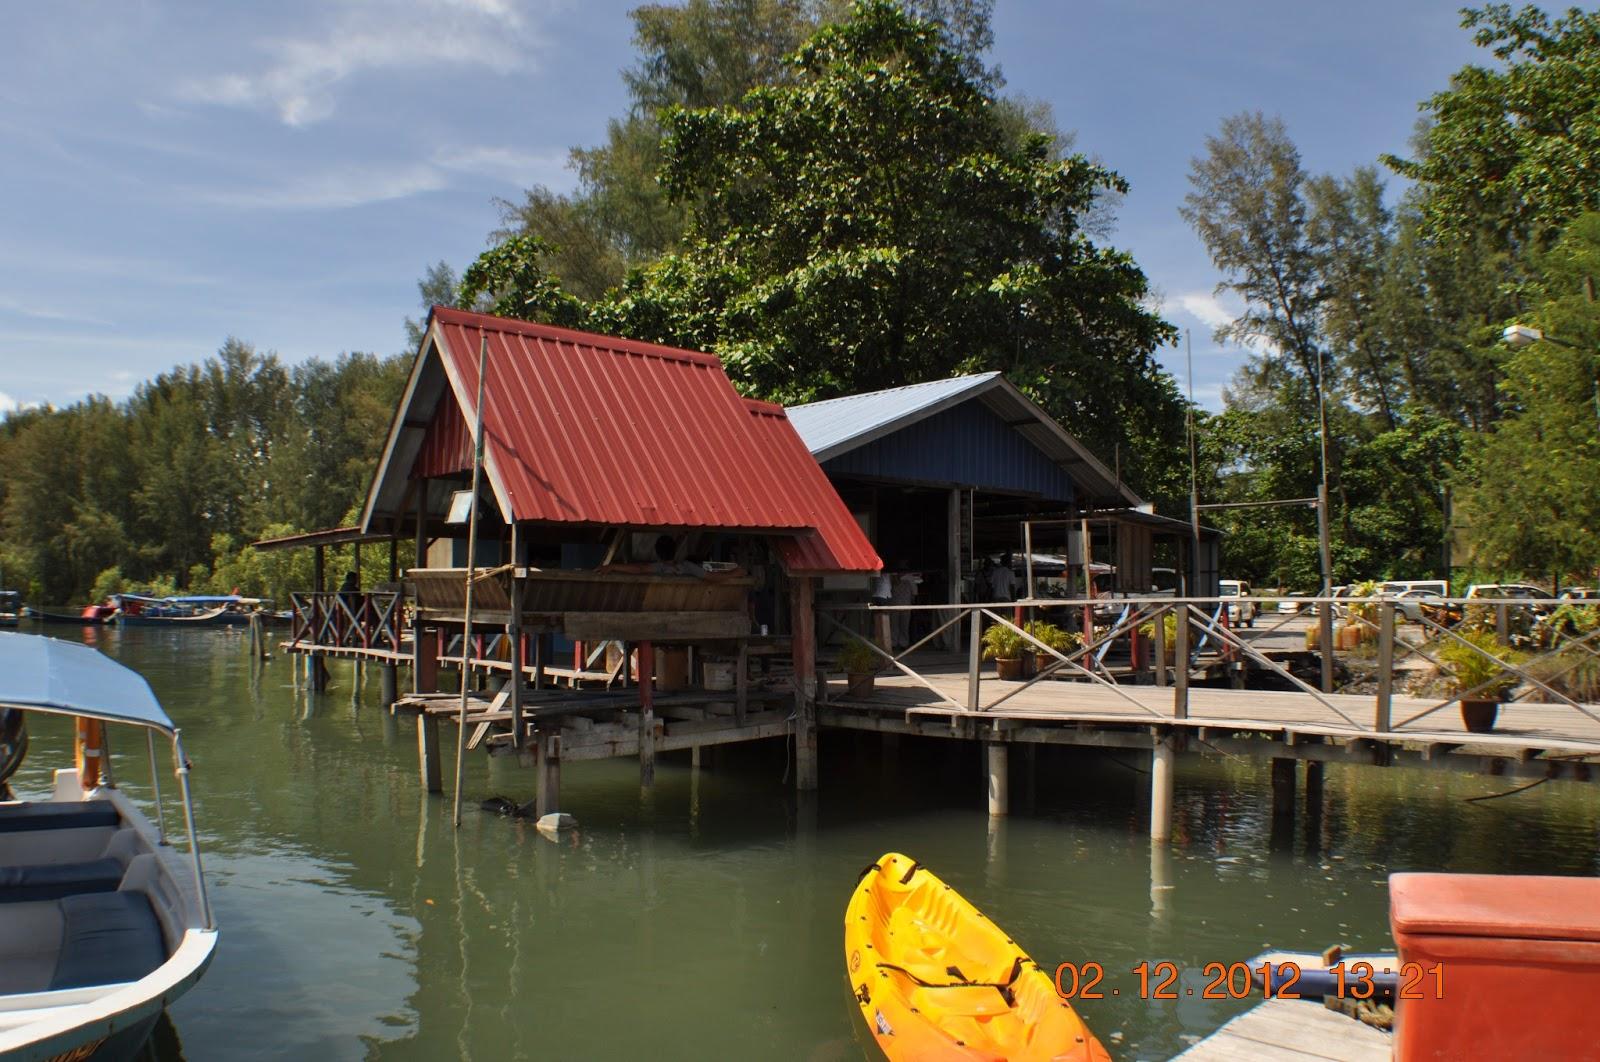 Tanjung rhu mangrove tour